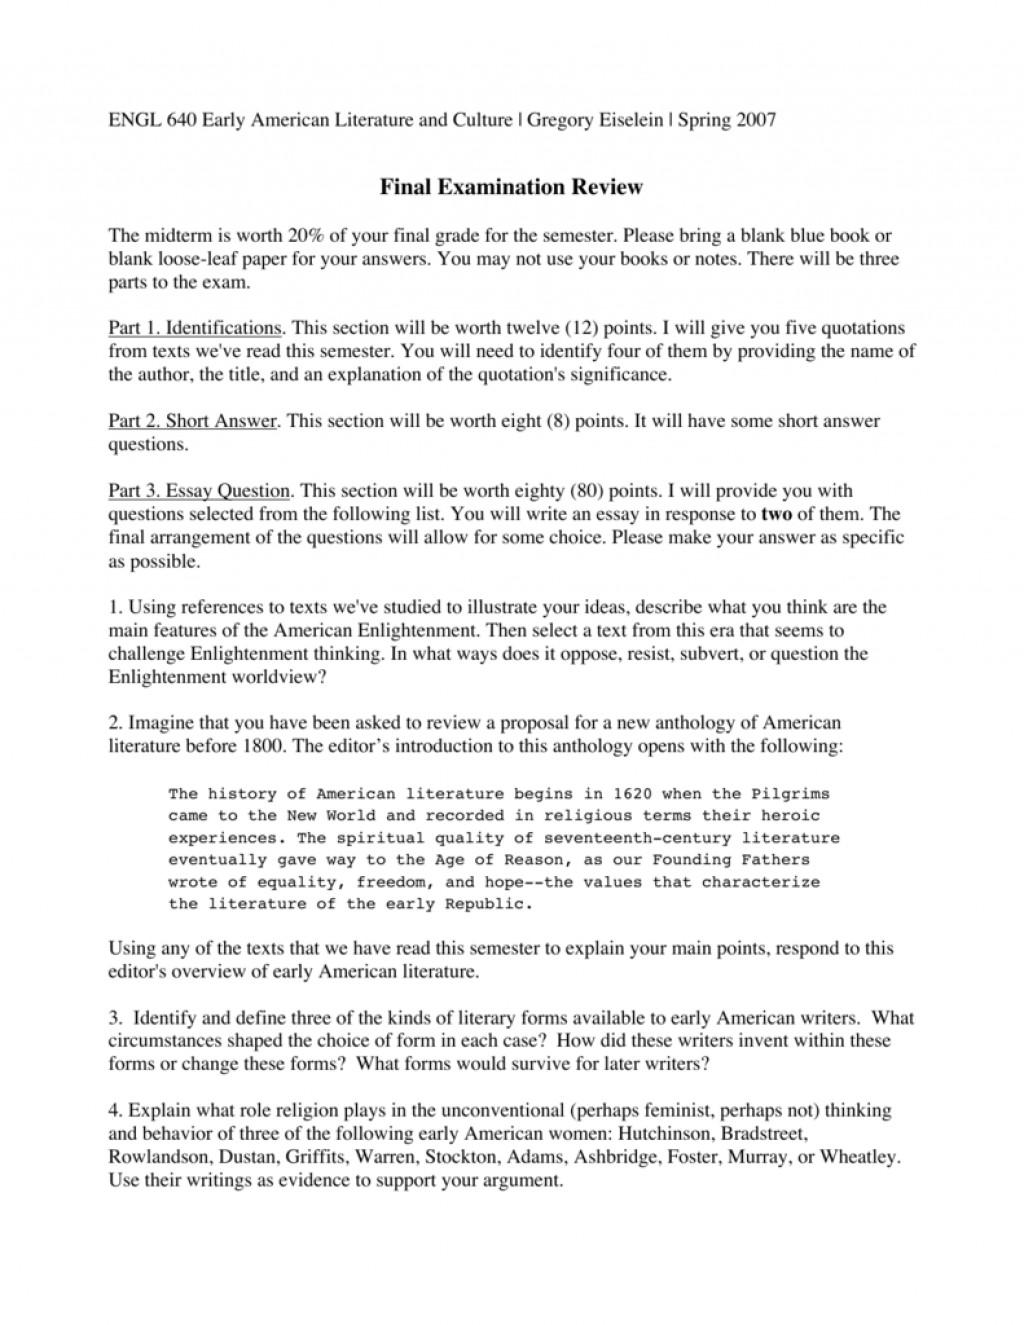 002 008918618 1 Essay Example Freedom Writers Striking Introduction Large